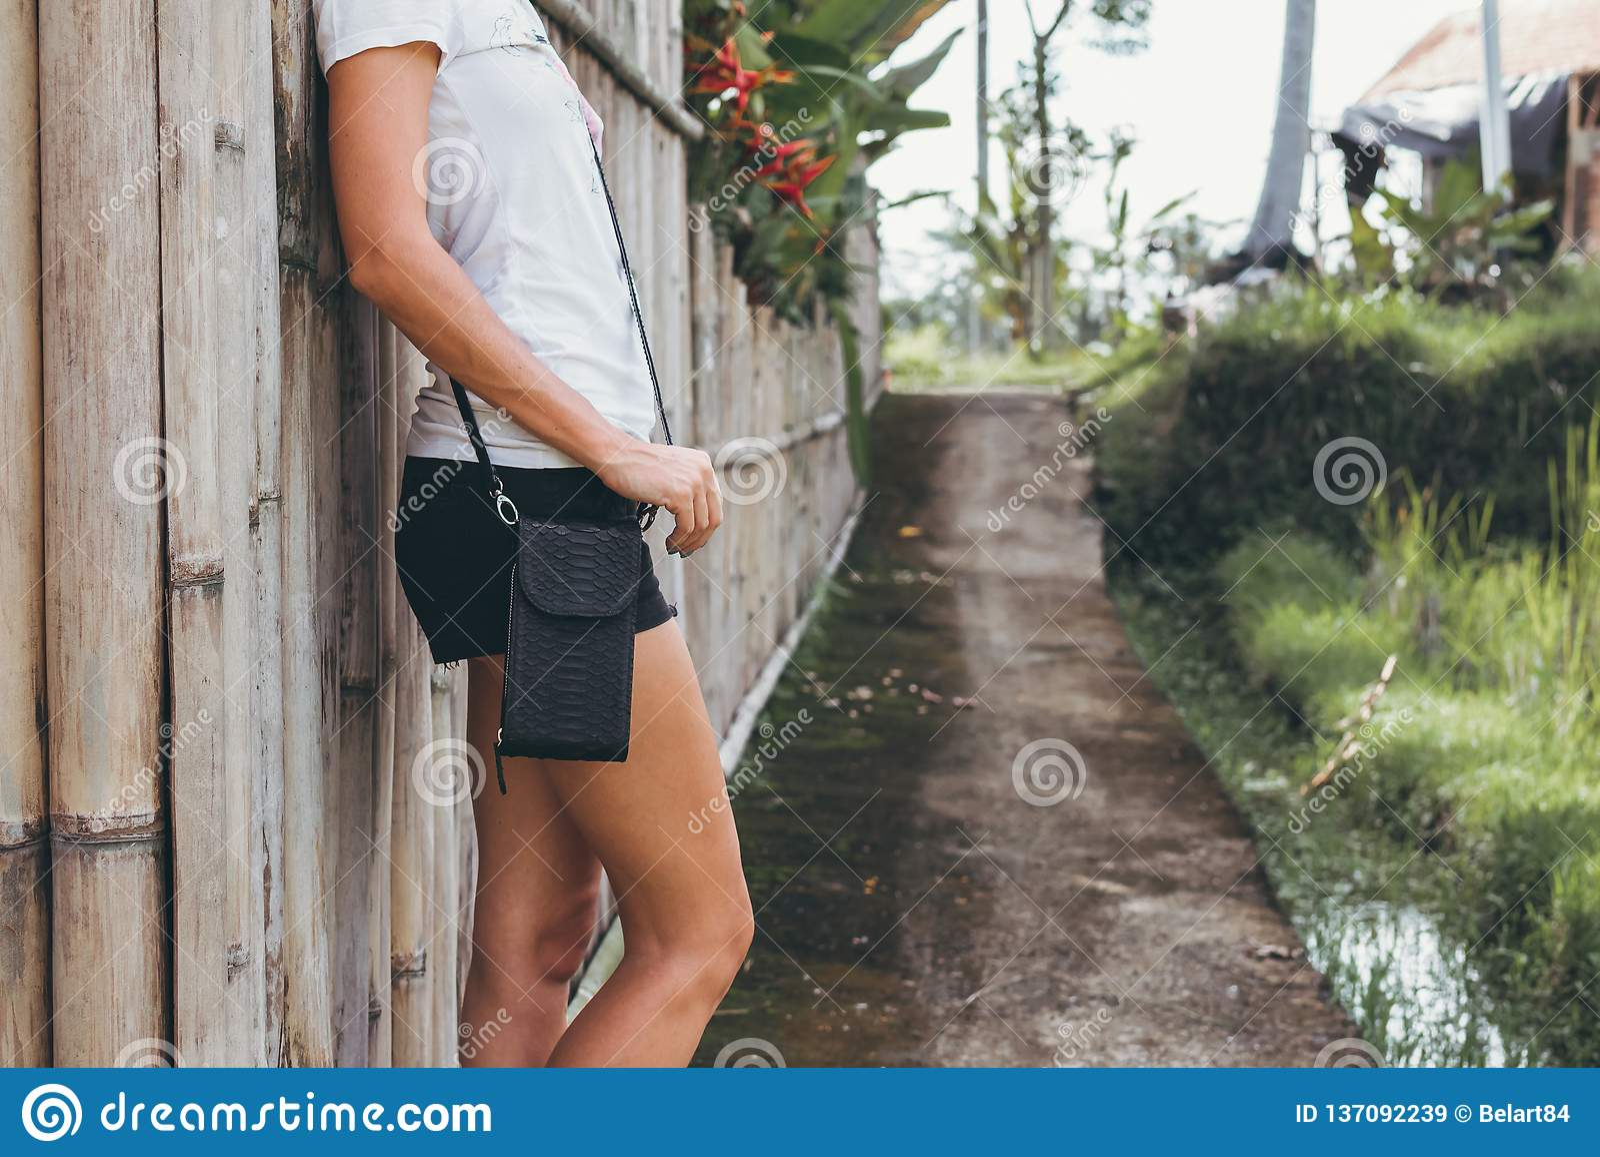 Young woman hands with stylish luxury snakeskin python handbag outdoors. Bali island.